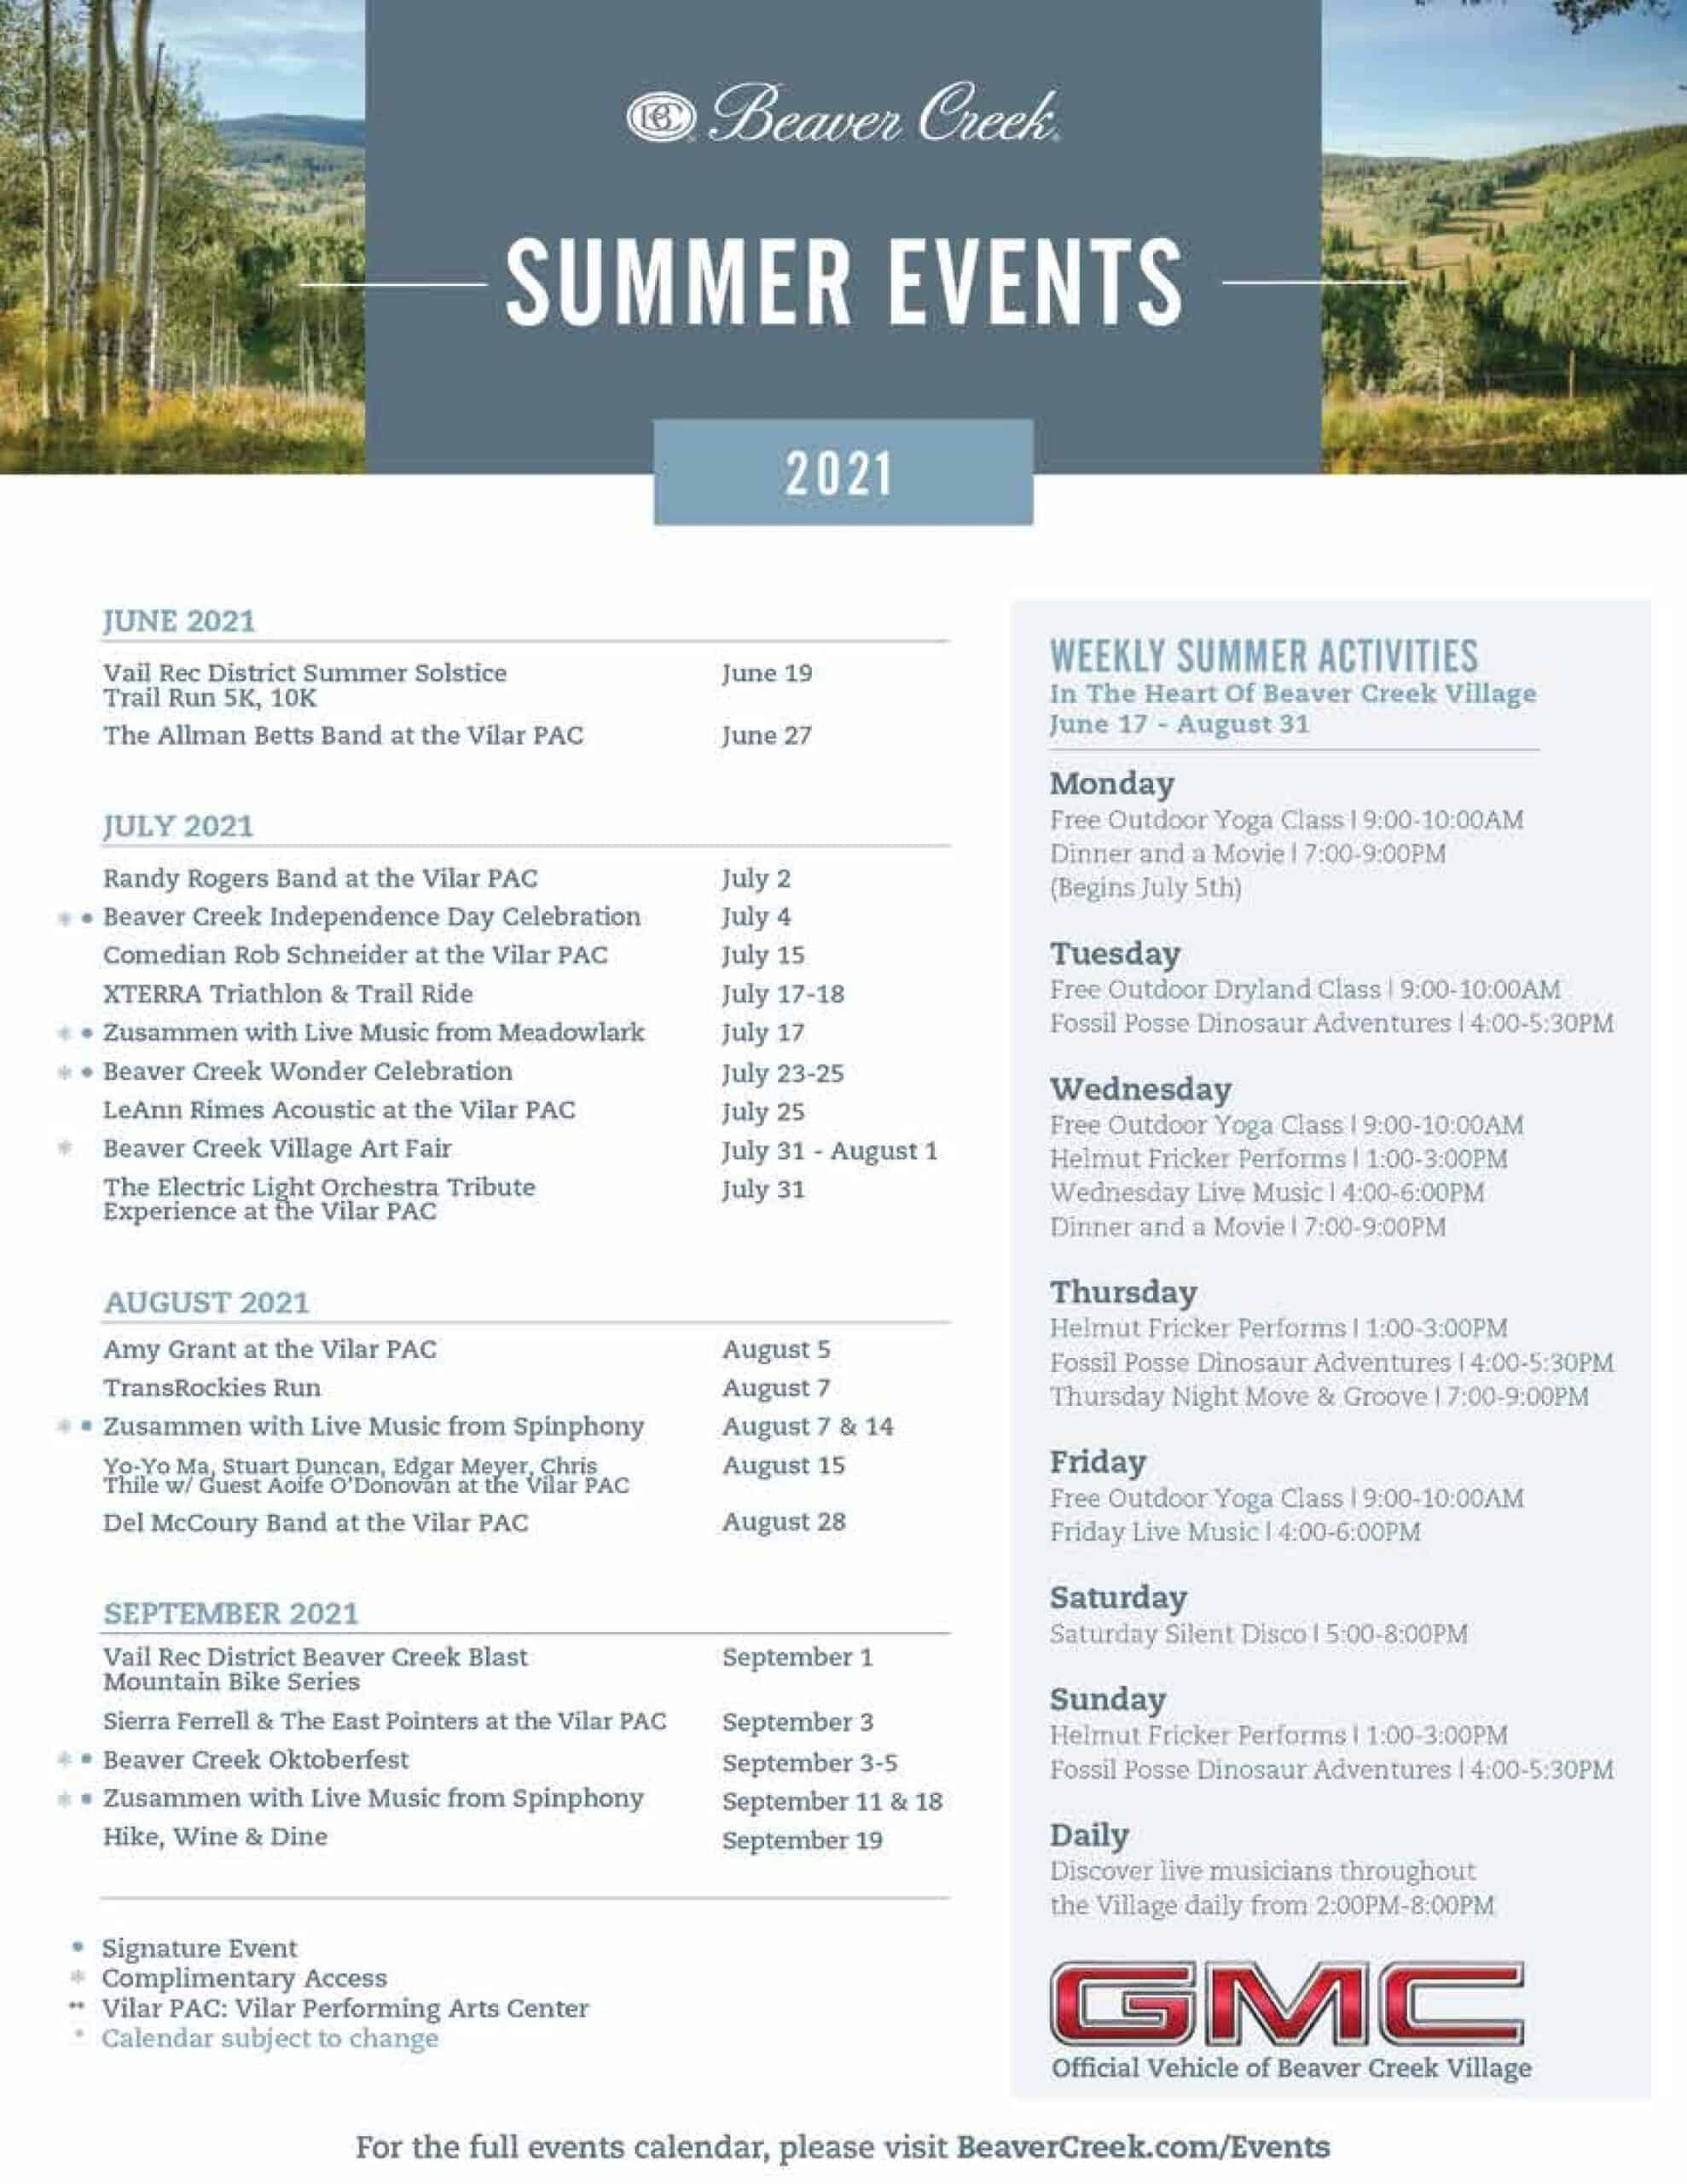 Beaver Creek 2021 Event Calendar